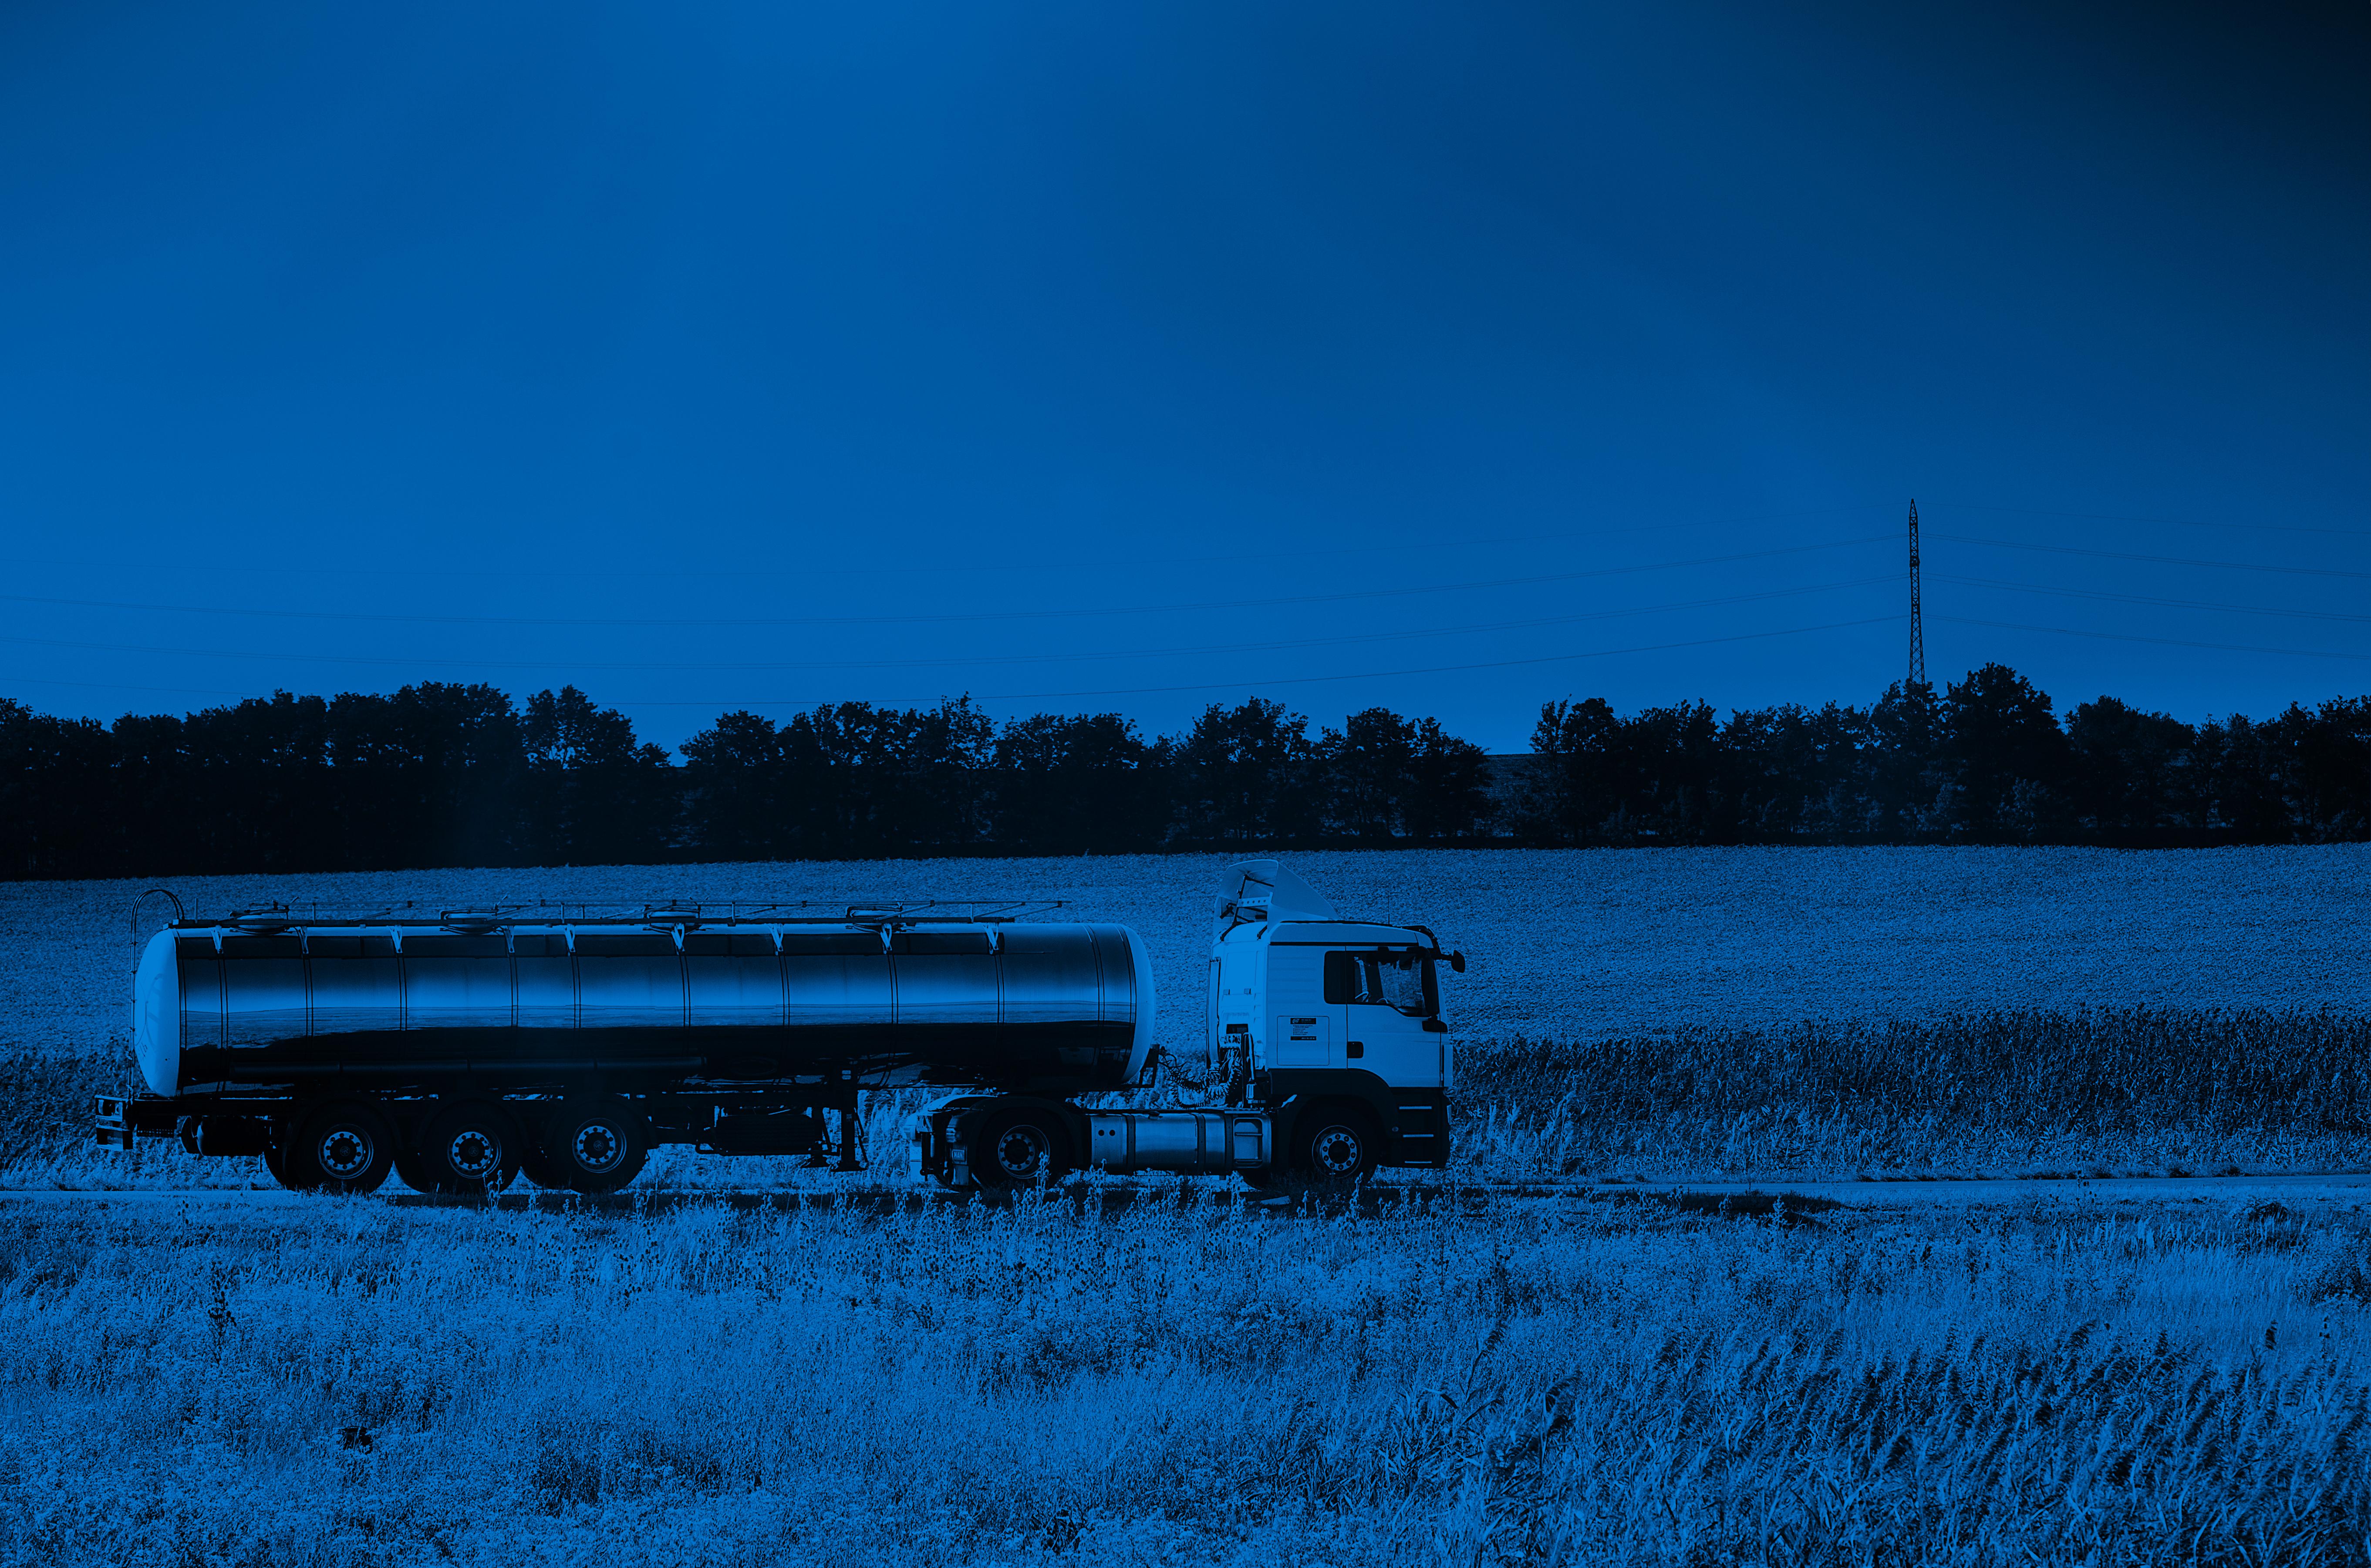 Contec milk tanker in blue filter